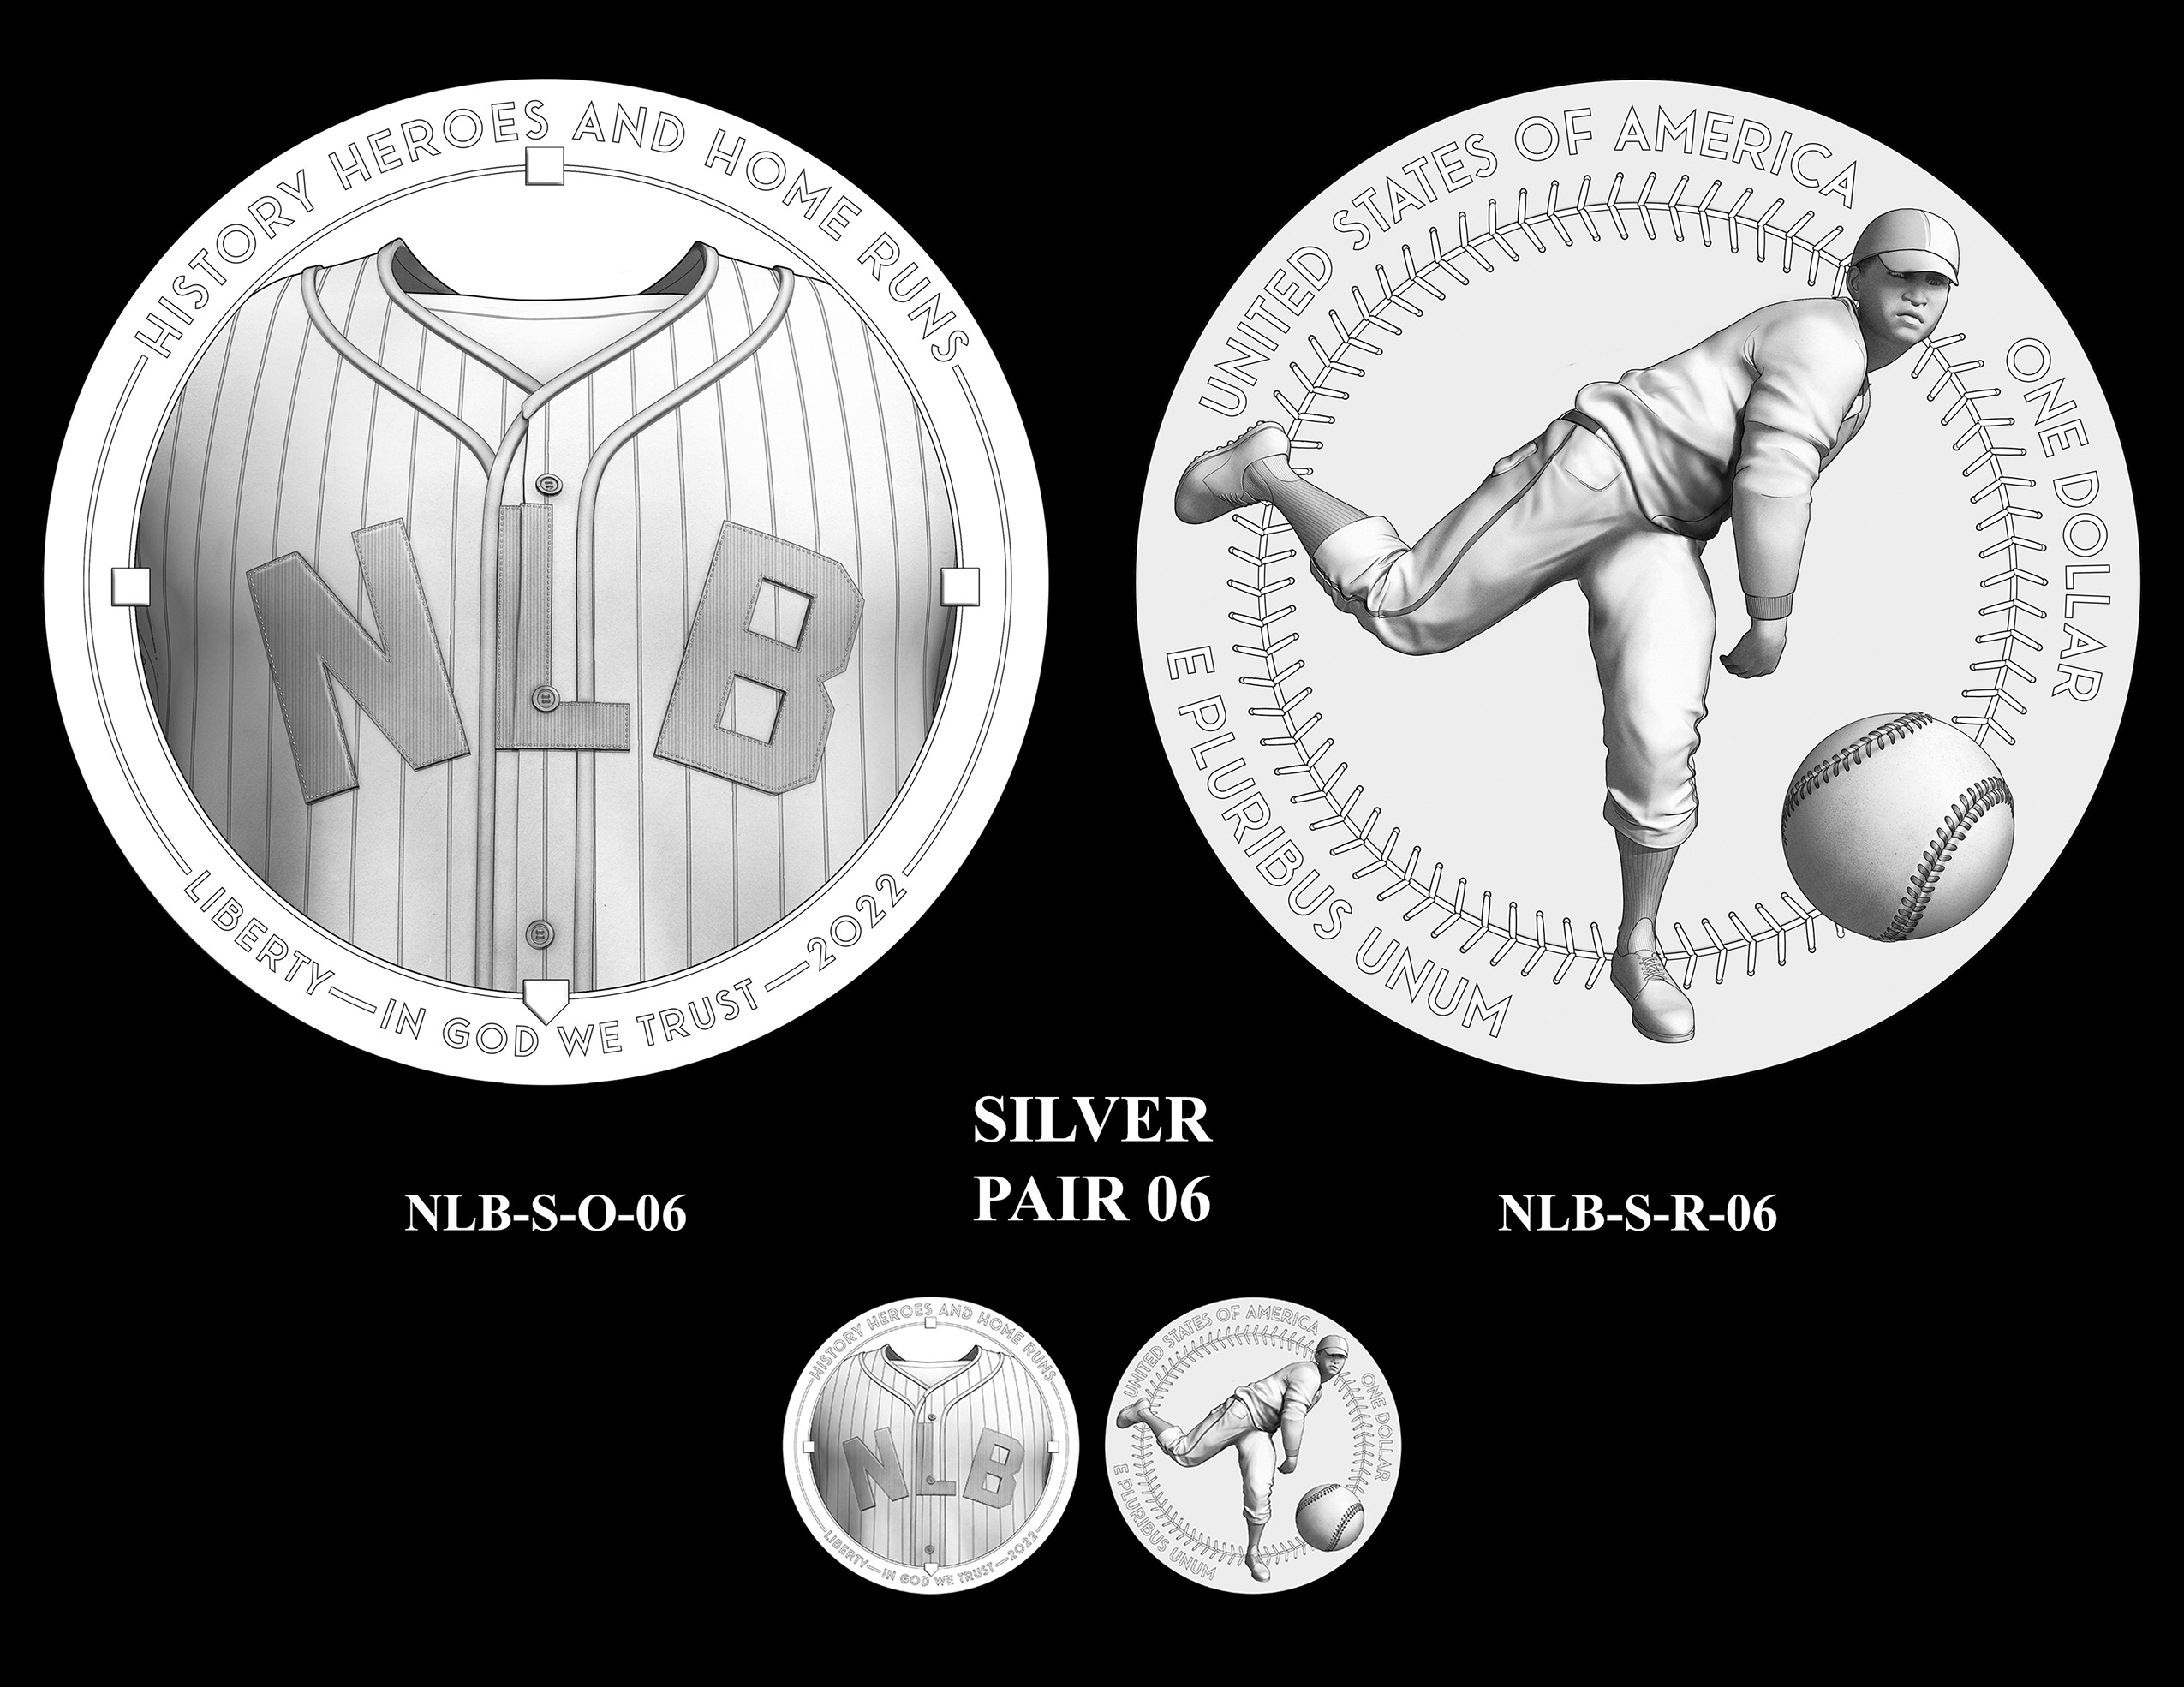 Silver Pair 06 -- Negro Leagues Baseball Commemorative Coin Program